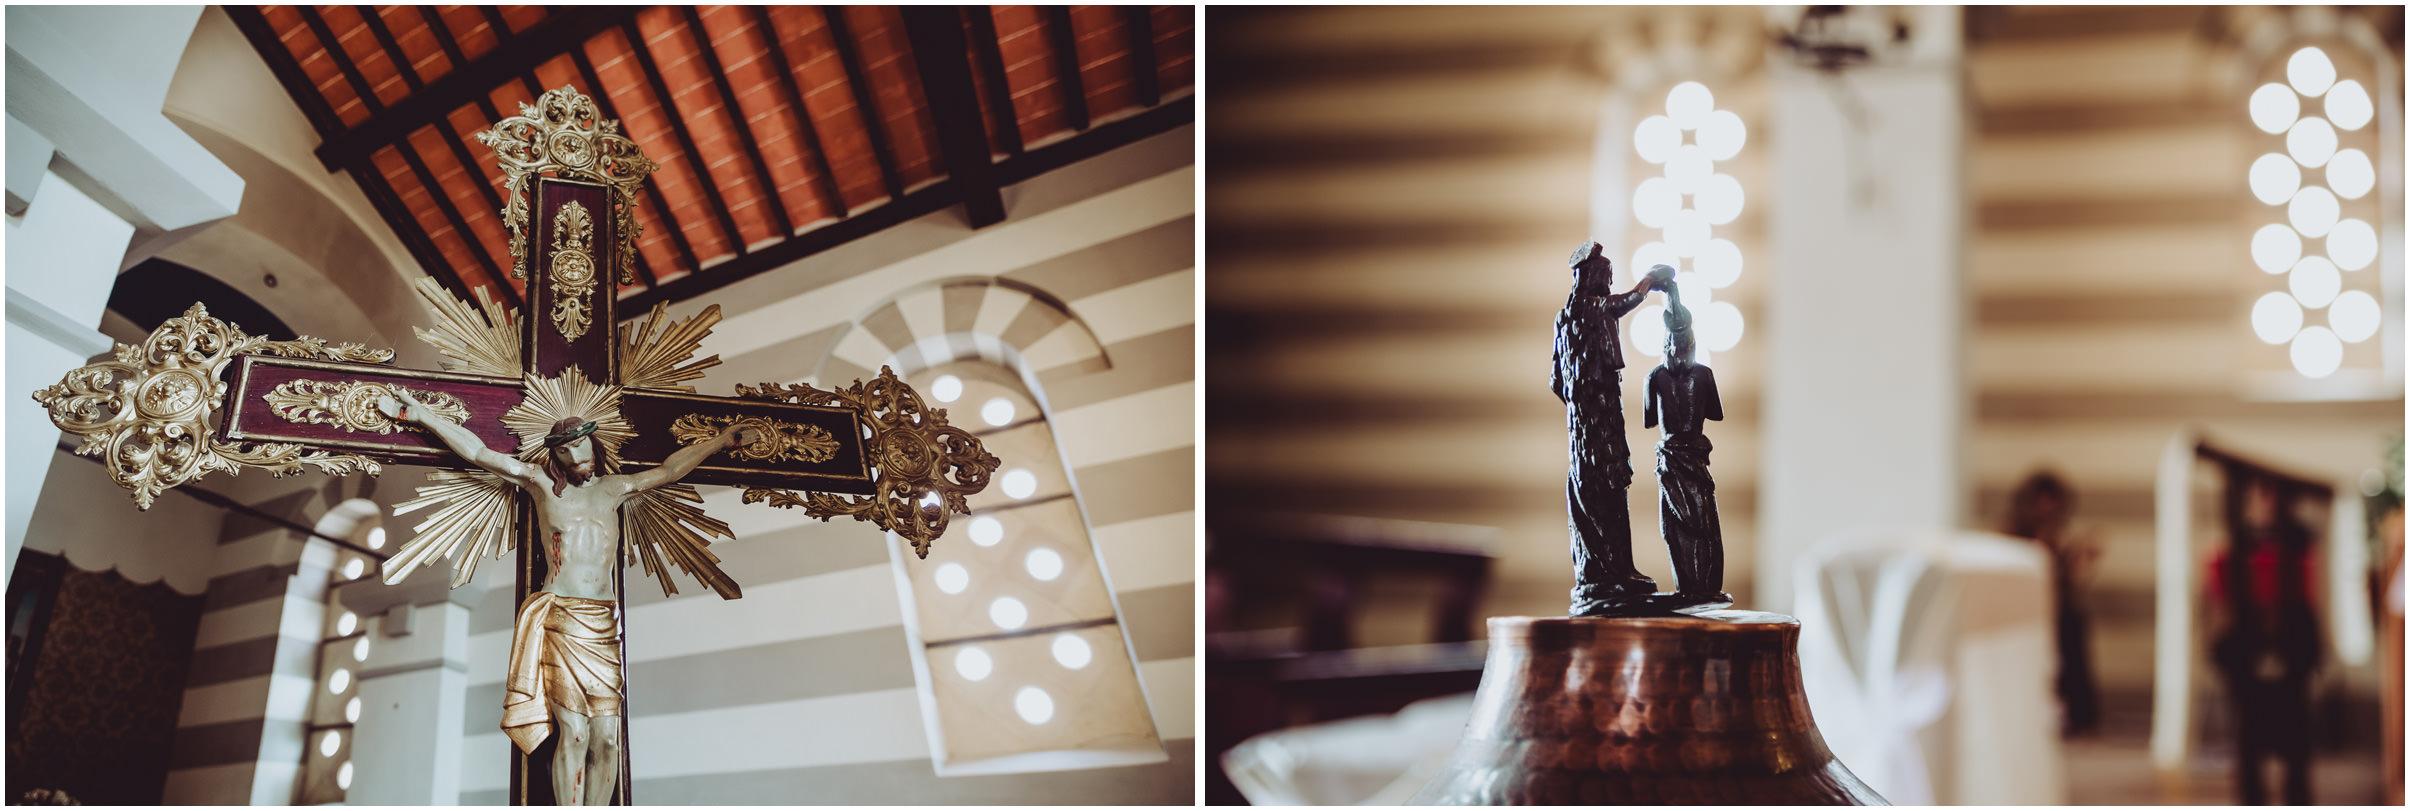 WEDDING-PHOTOGRAPHY-SARA-LORENZONI-FOTOGRAFIA-MATRIMONIO-ORVIETO-JUKA-ANTONELLO03